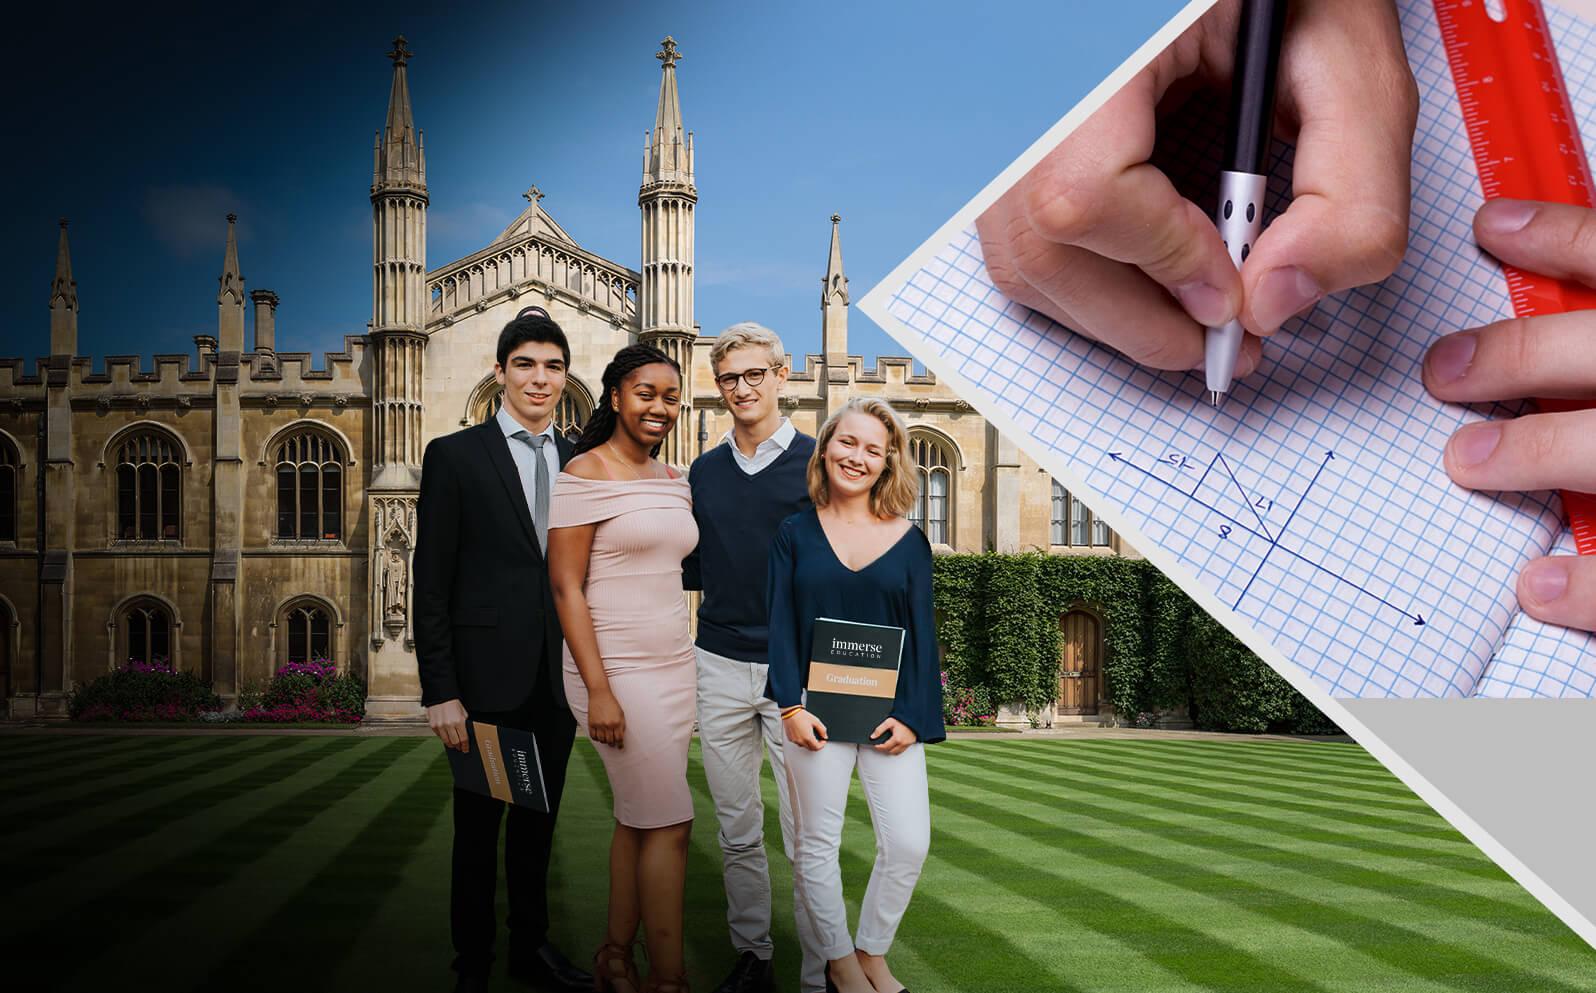 Cambridge Mathematics Summer Program for Ages 16-18